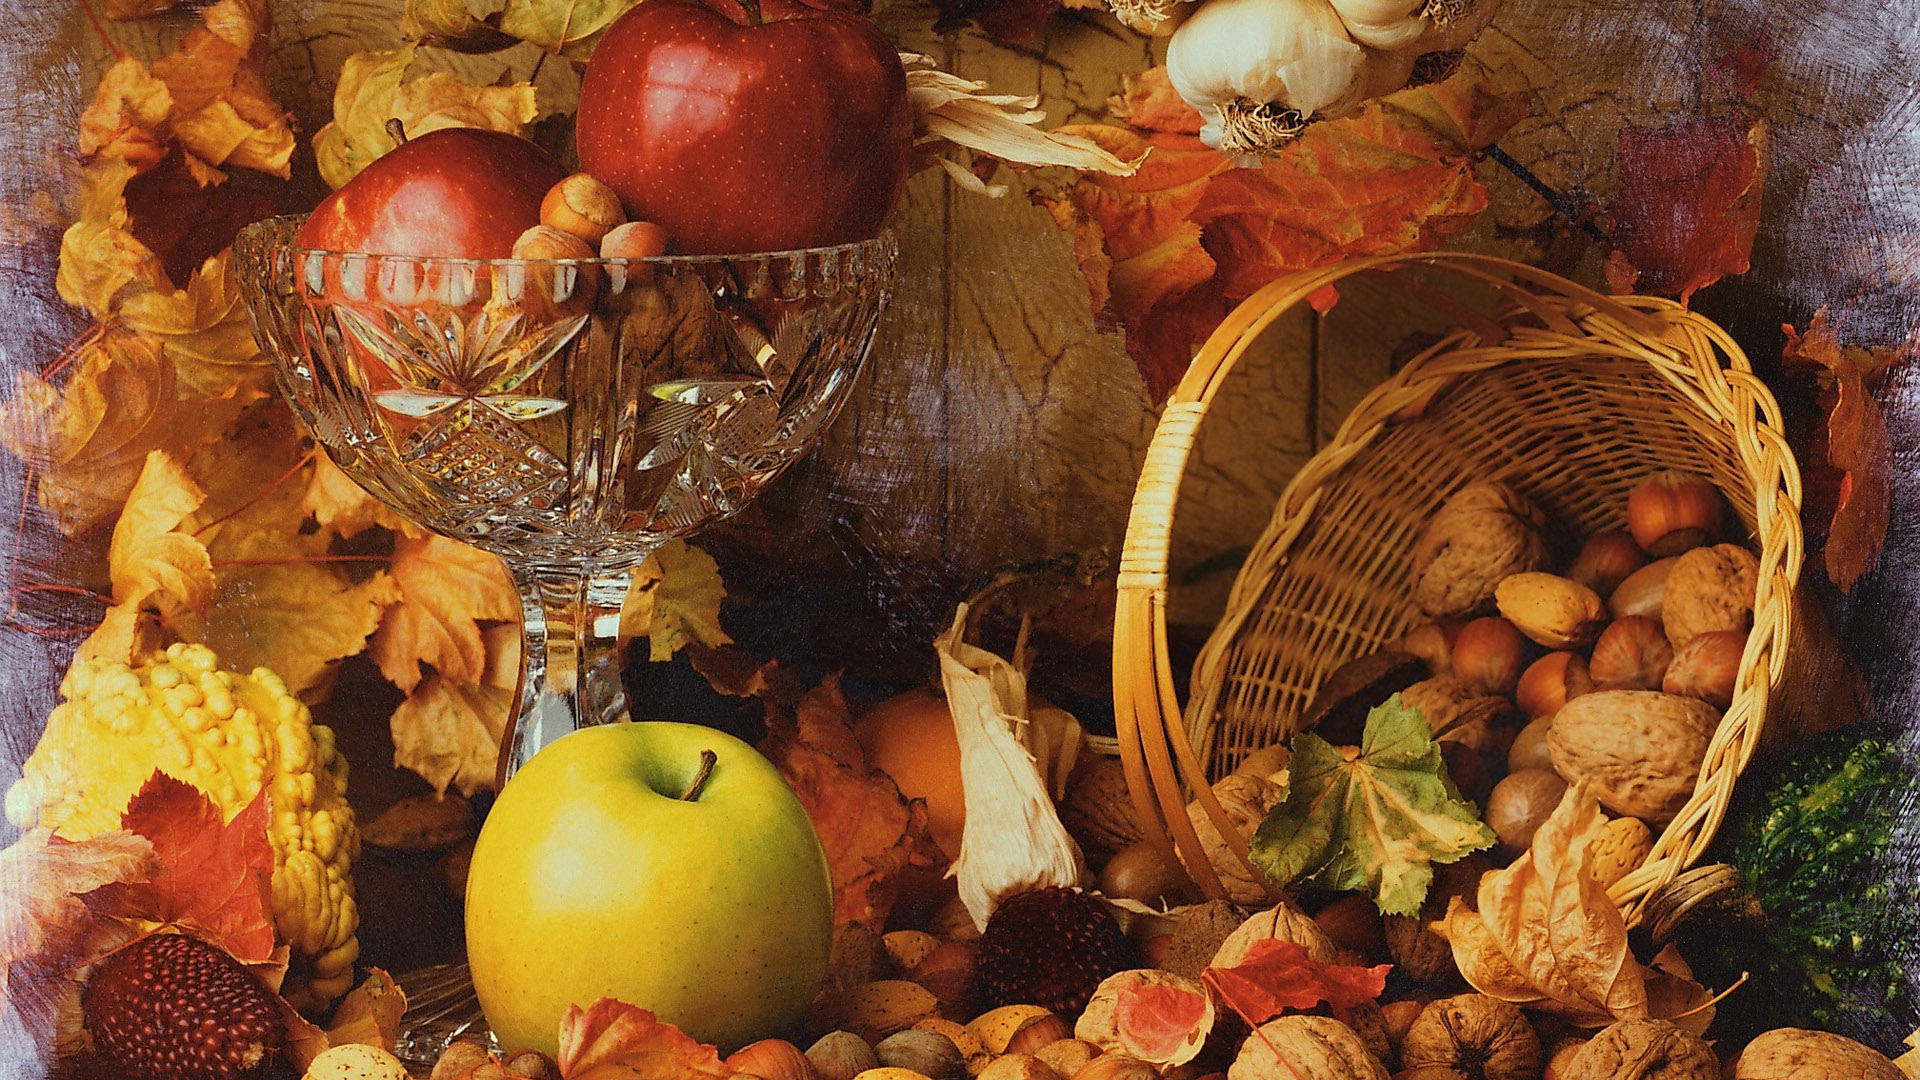 Thanksgiving Wallpaper HD Download 2018 1920x1080